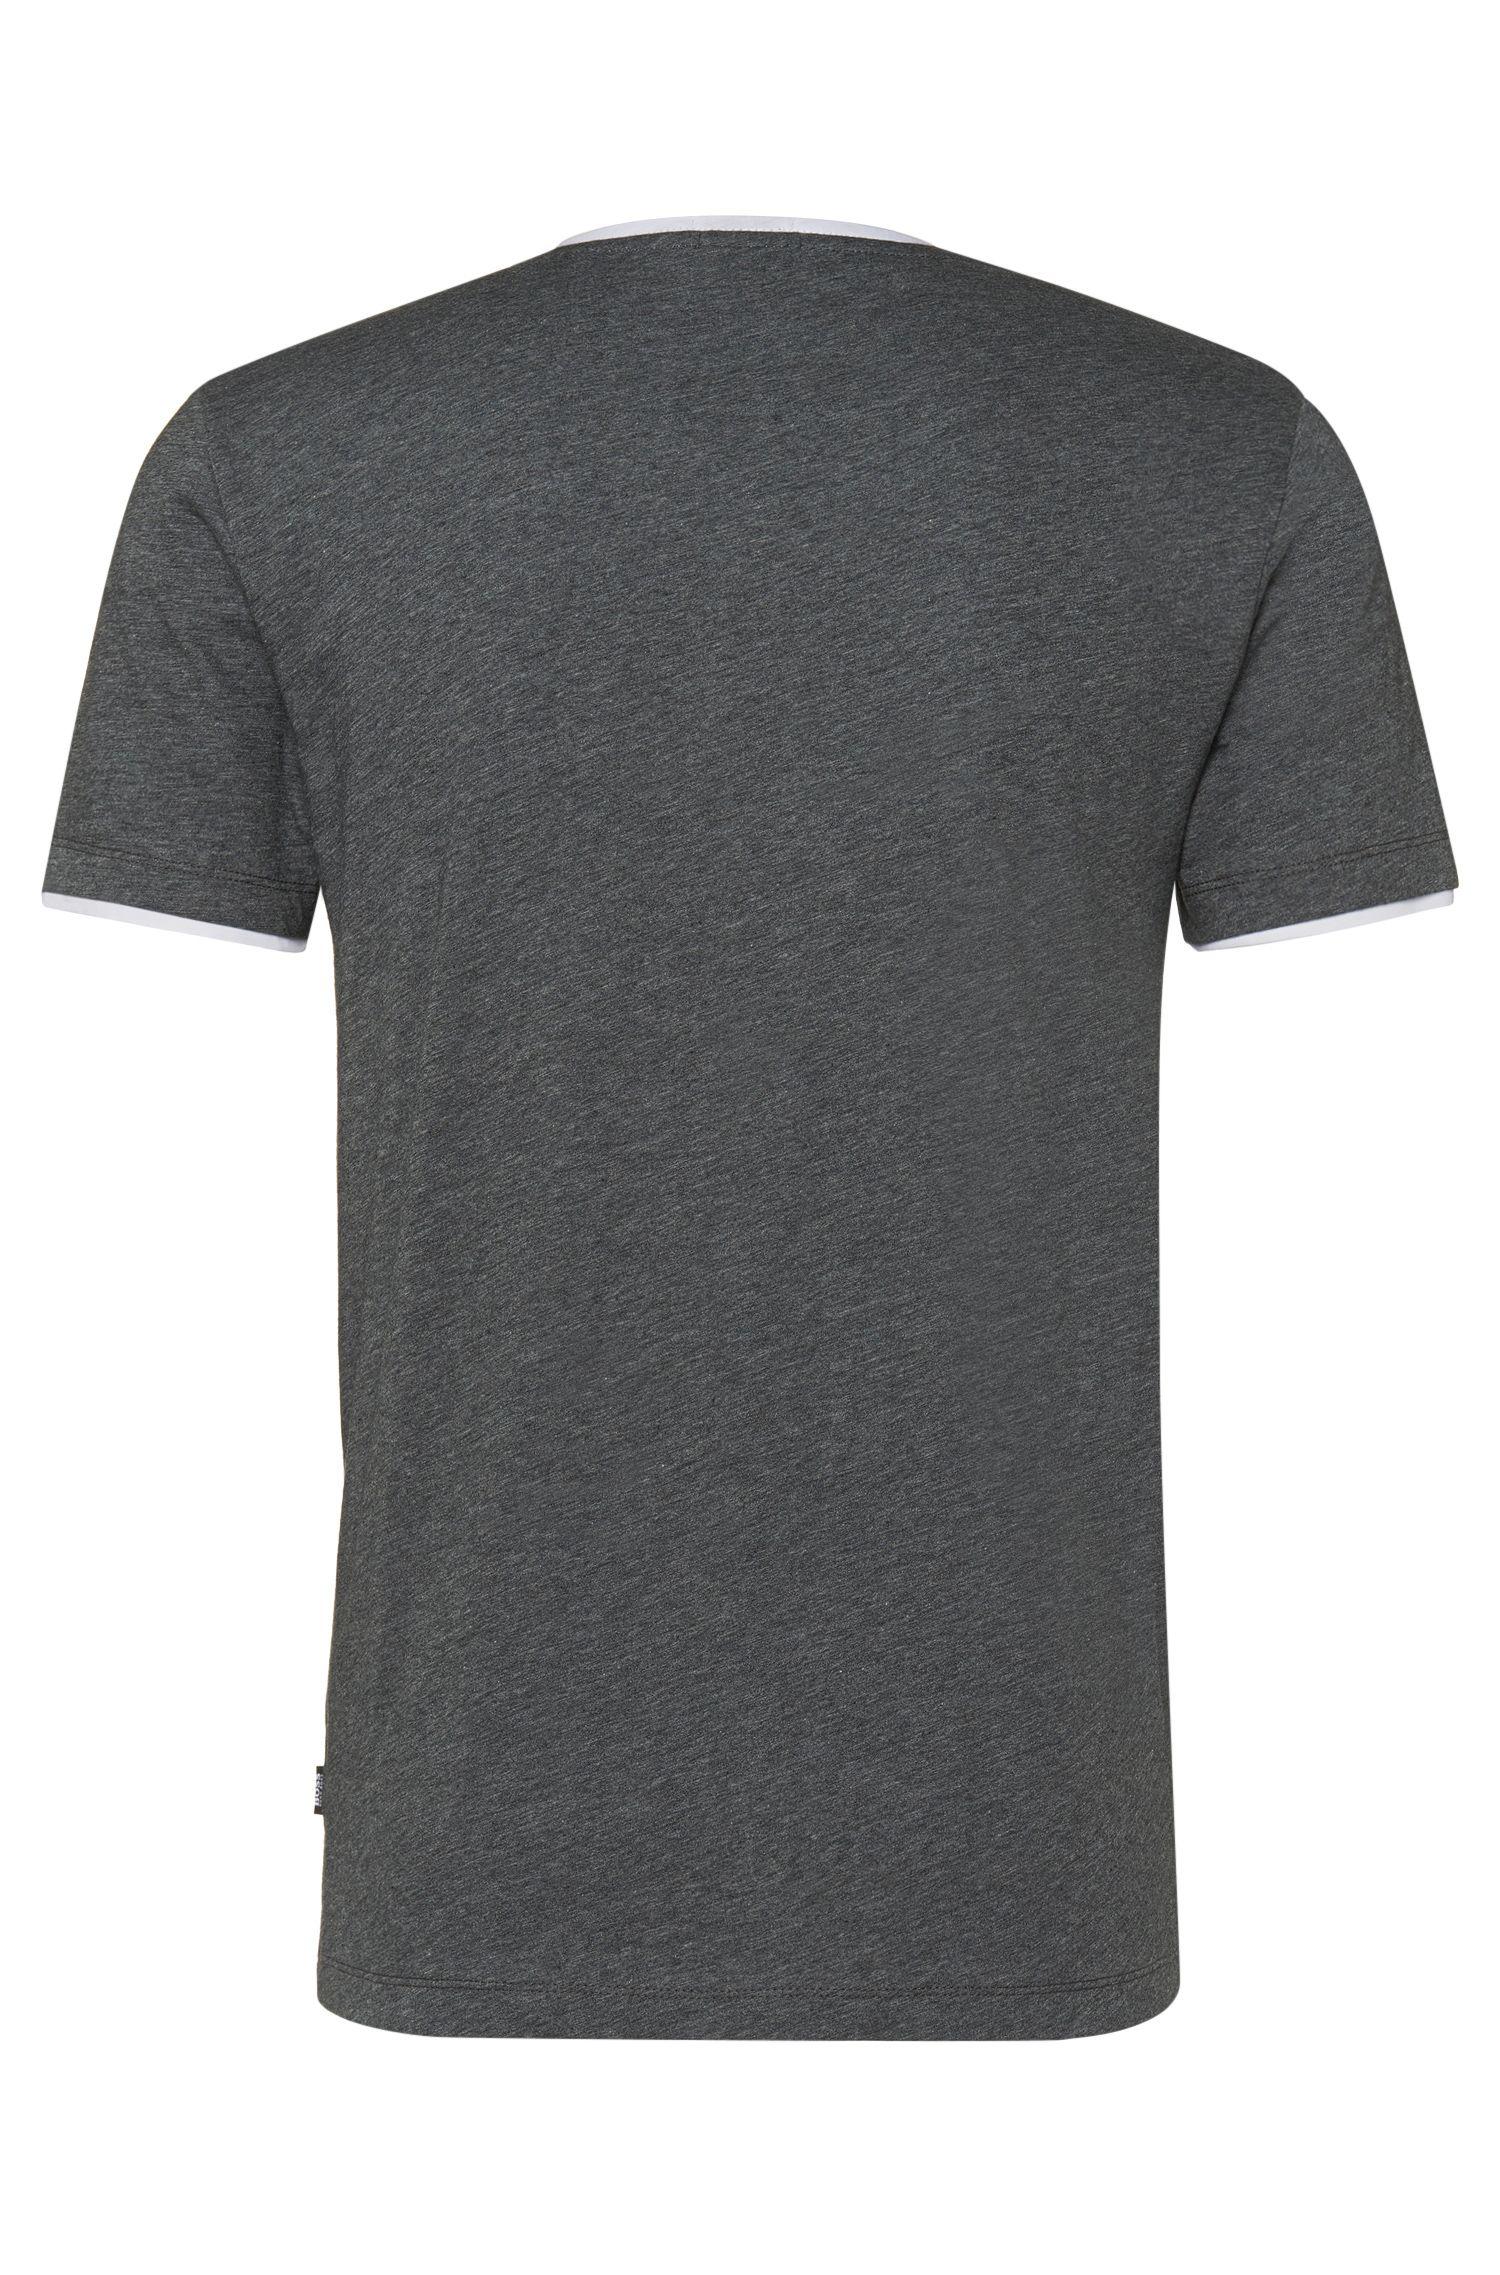 T-shirt Slim Fit en coton: «Tessler19»